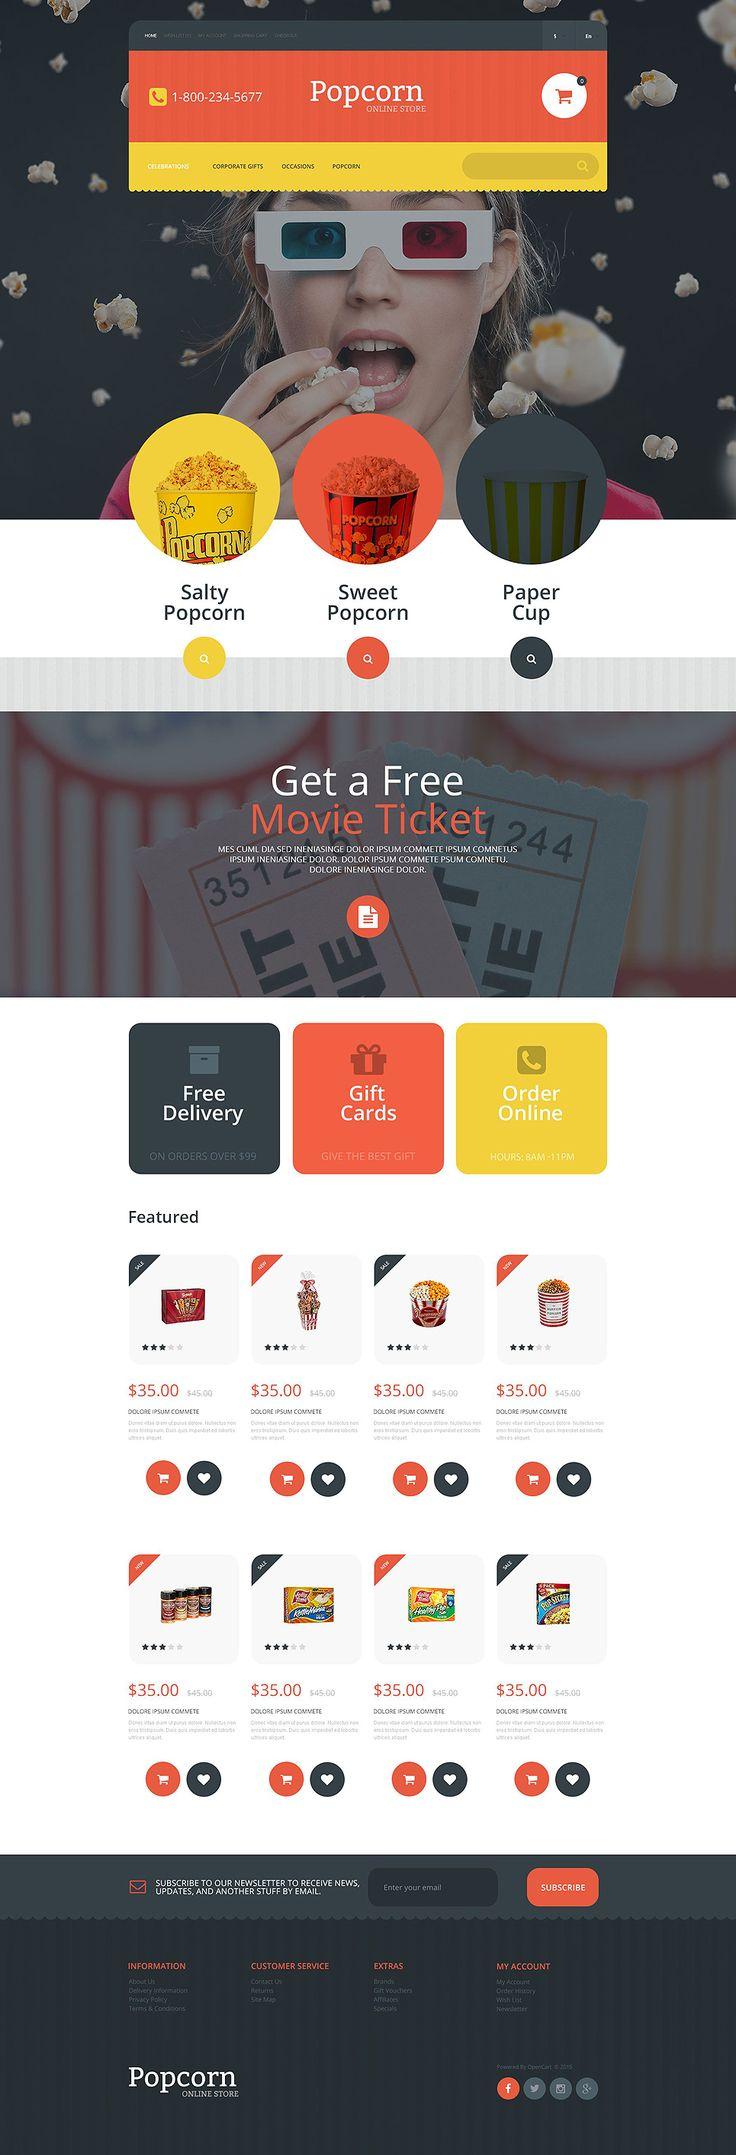 #Popcorn Online Store #OpenCart #Template #website #food http://www.templatemonster.com/opencart-templates/55039.html?utm_source=pinterest&utm_medium=timeline&utm_campaign=55039opc